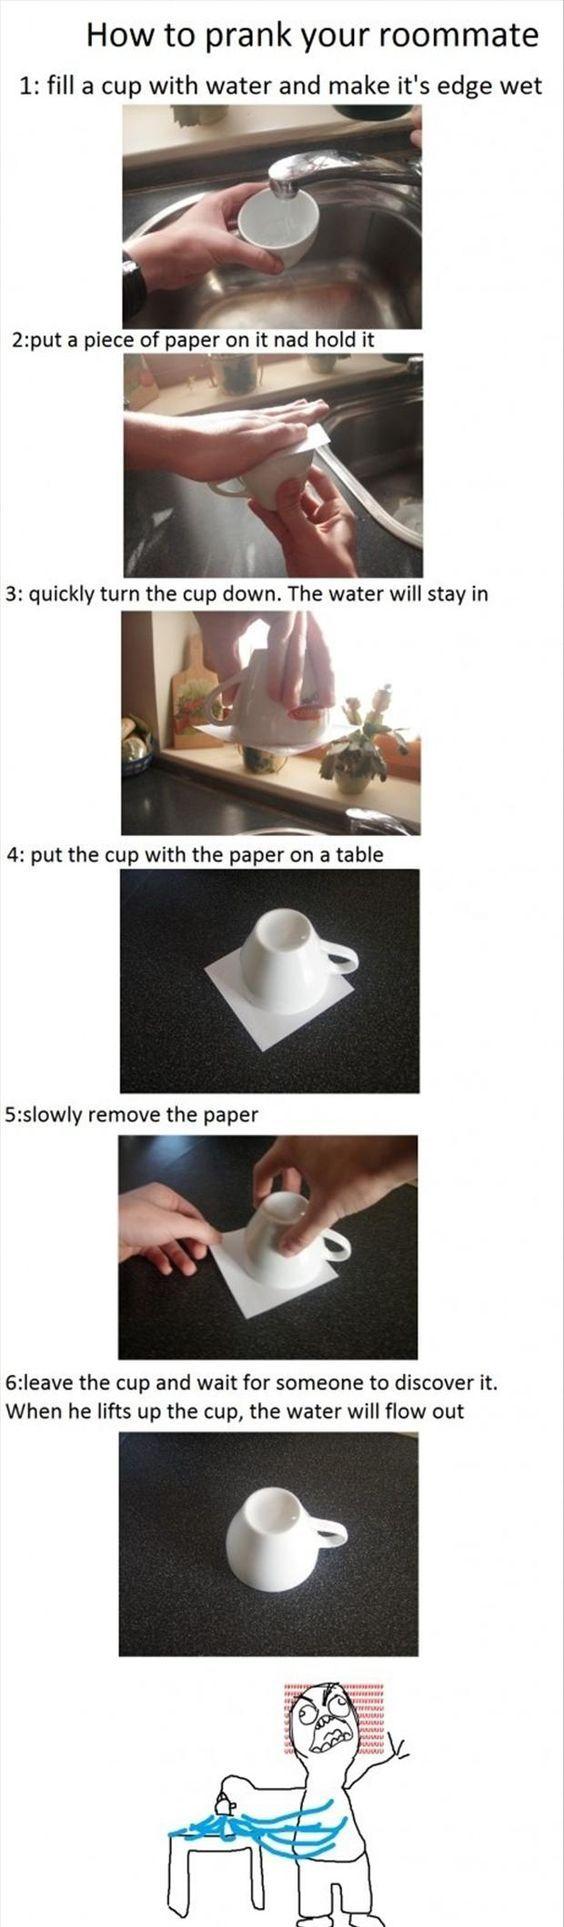 prank ideas